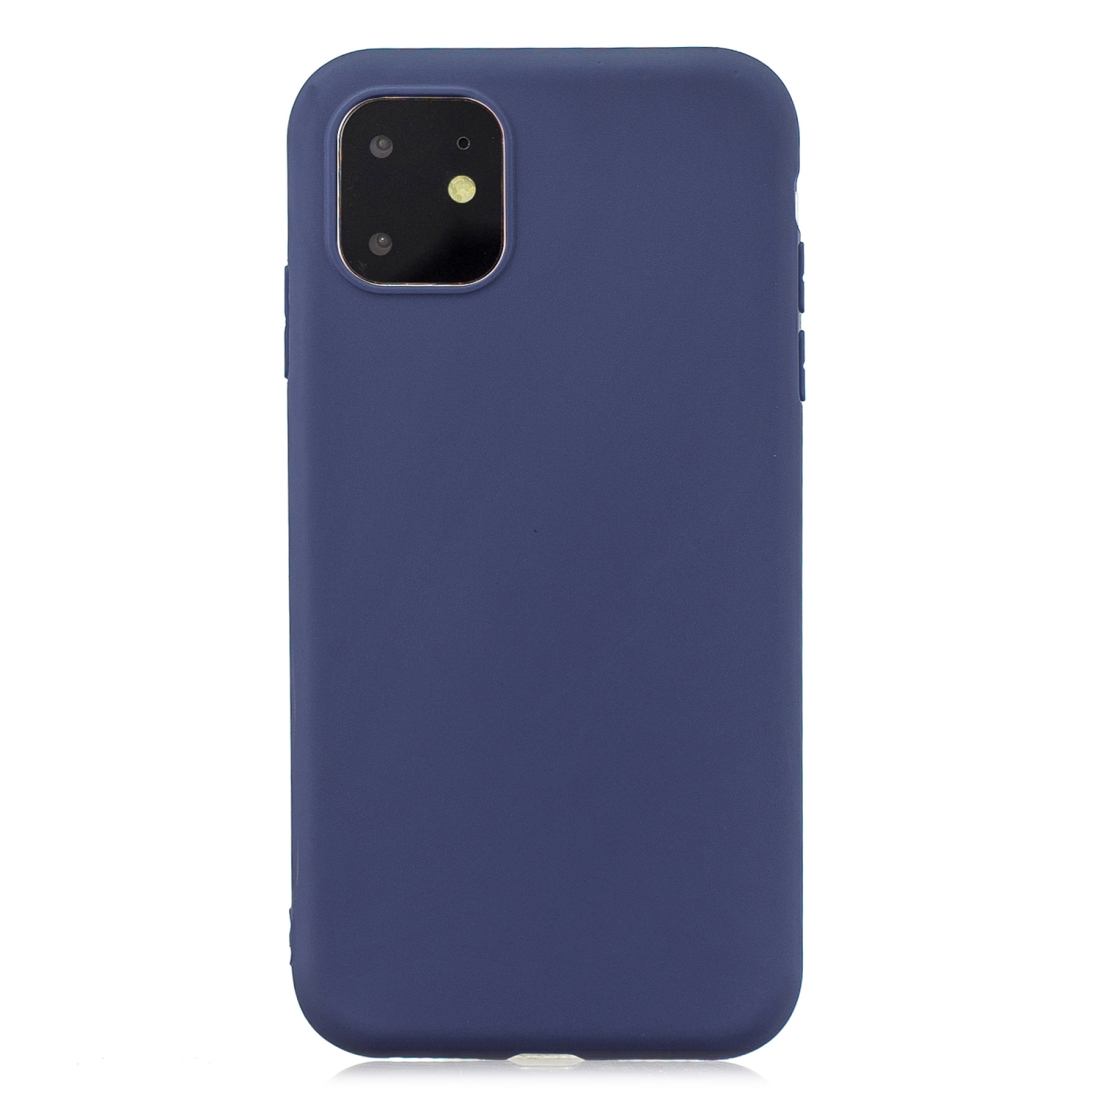 Matný silikonový obal na iPhone 11 - tmavě modrá